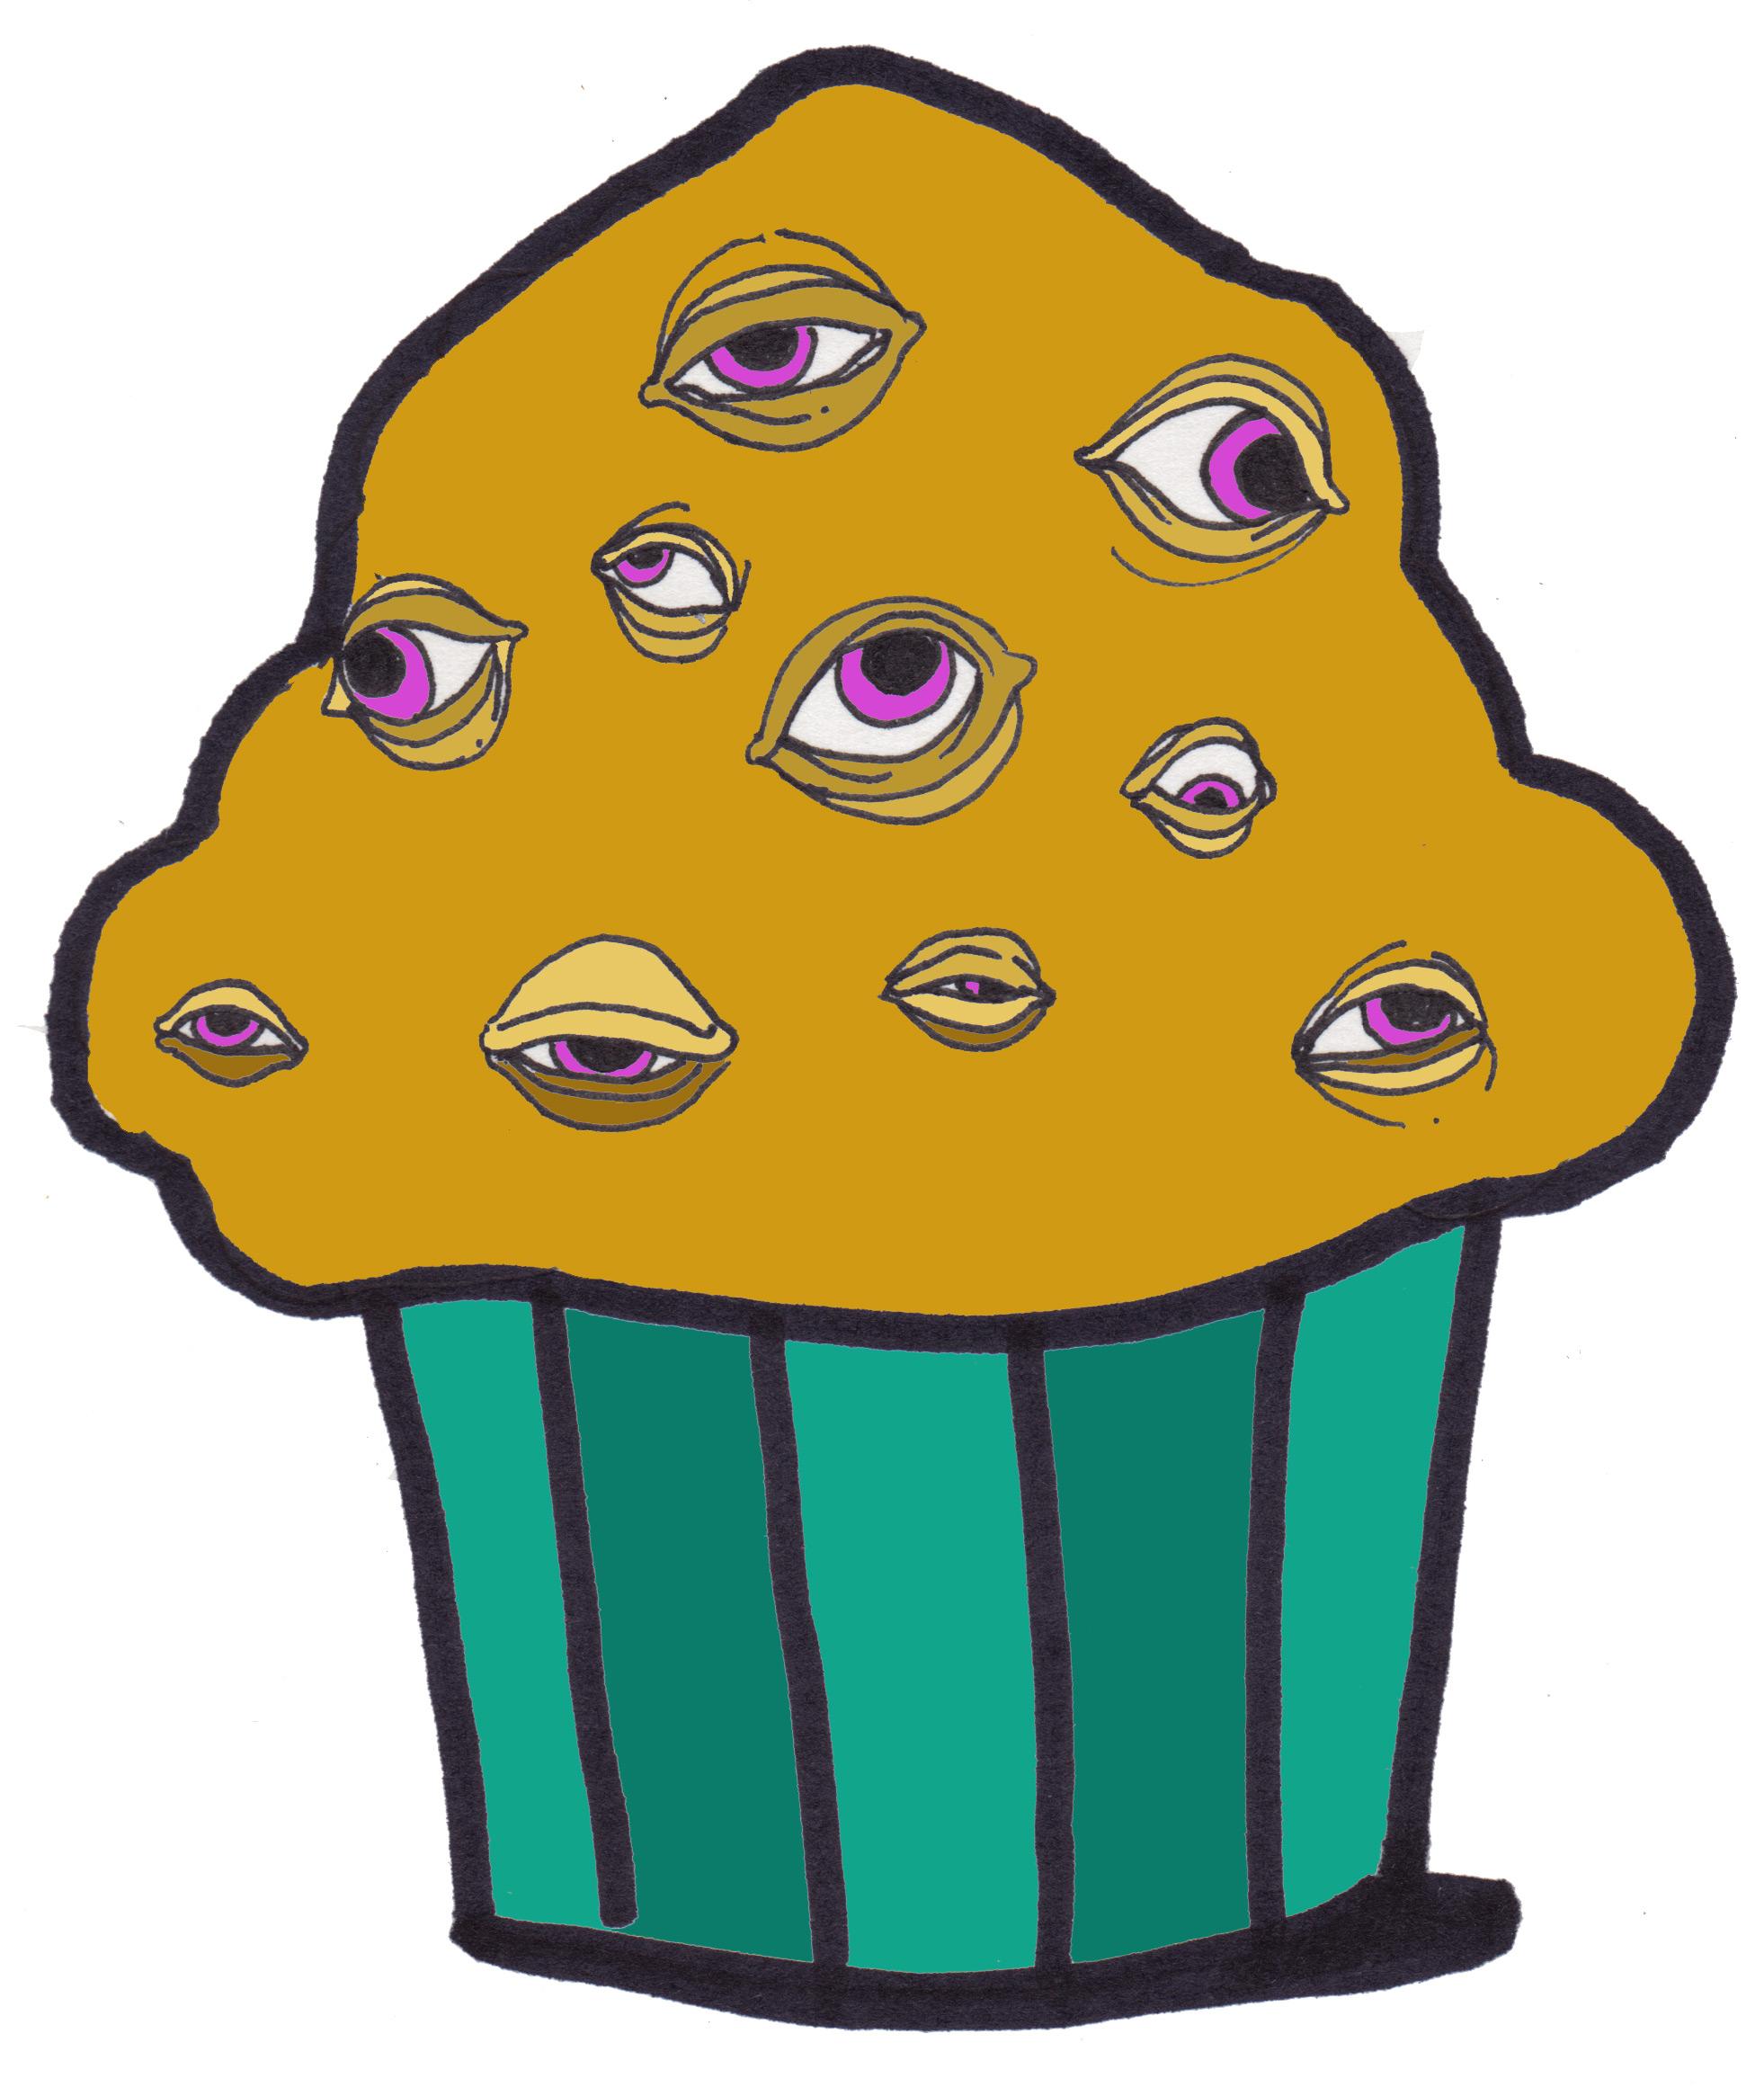 Pia Supino-Mayka, Illustrator and muffin afficionada